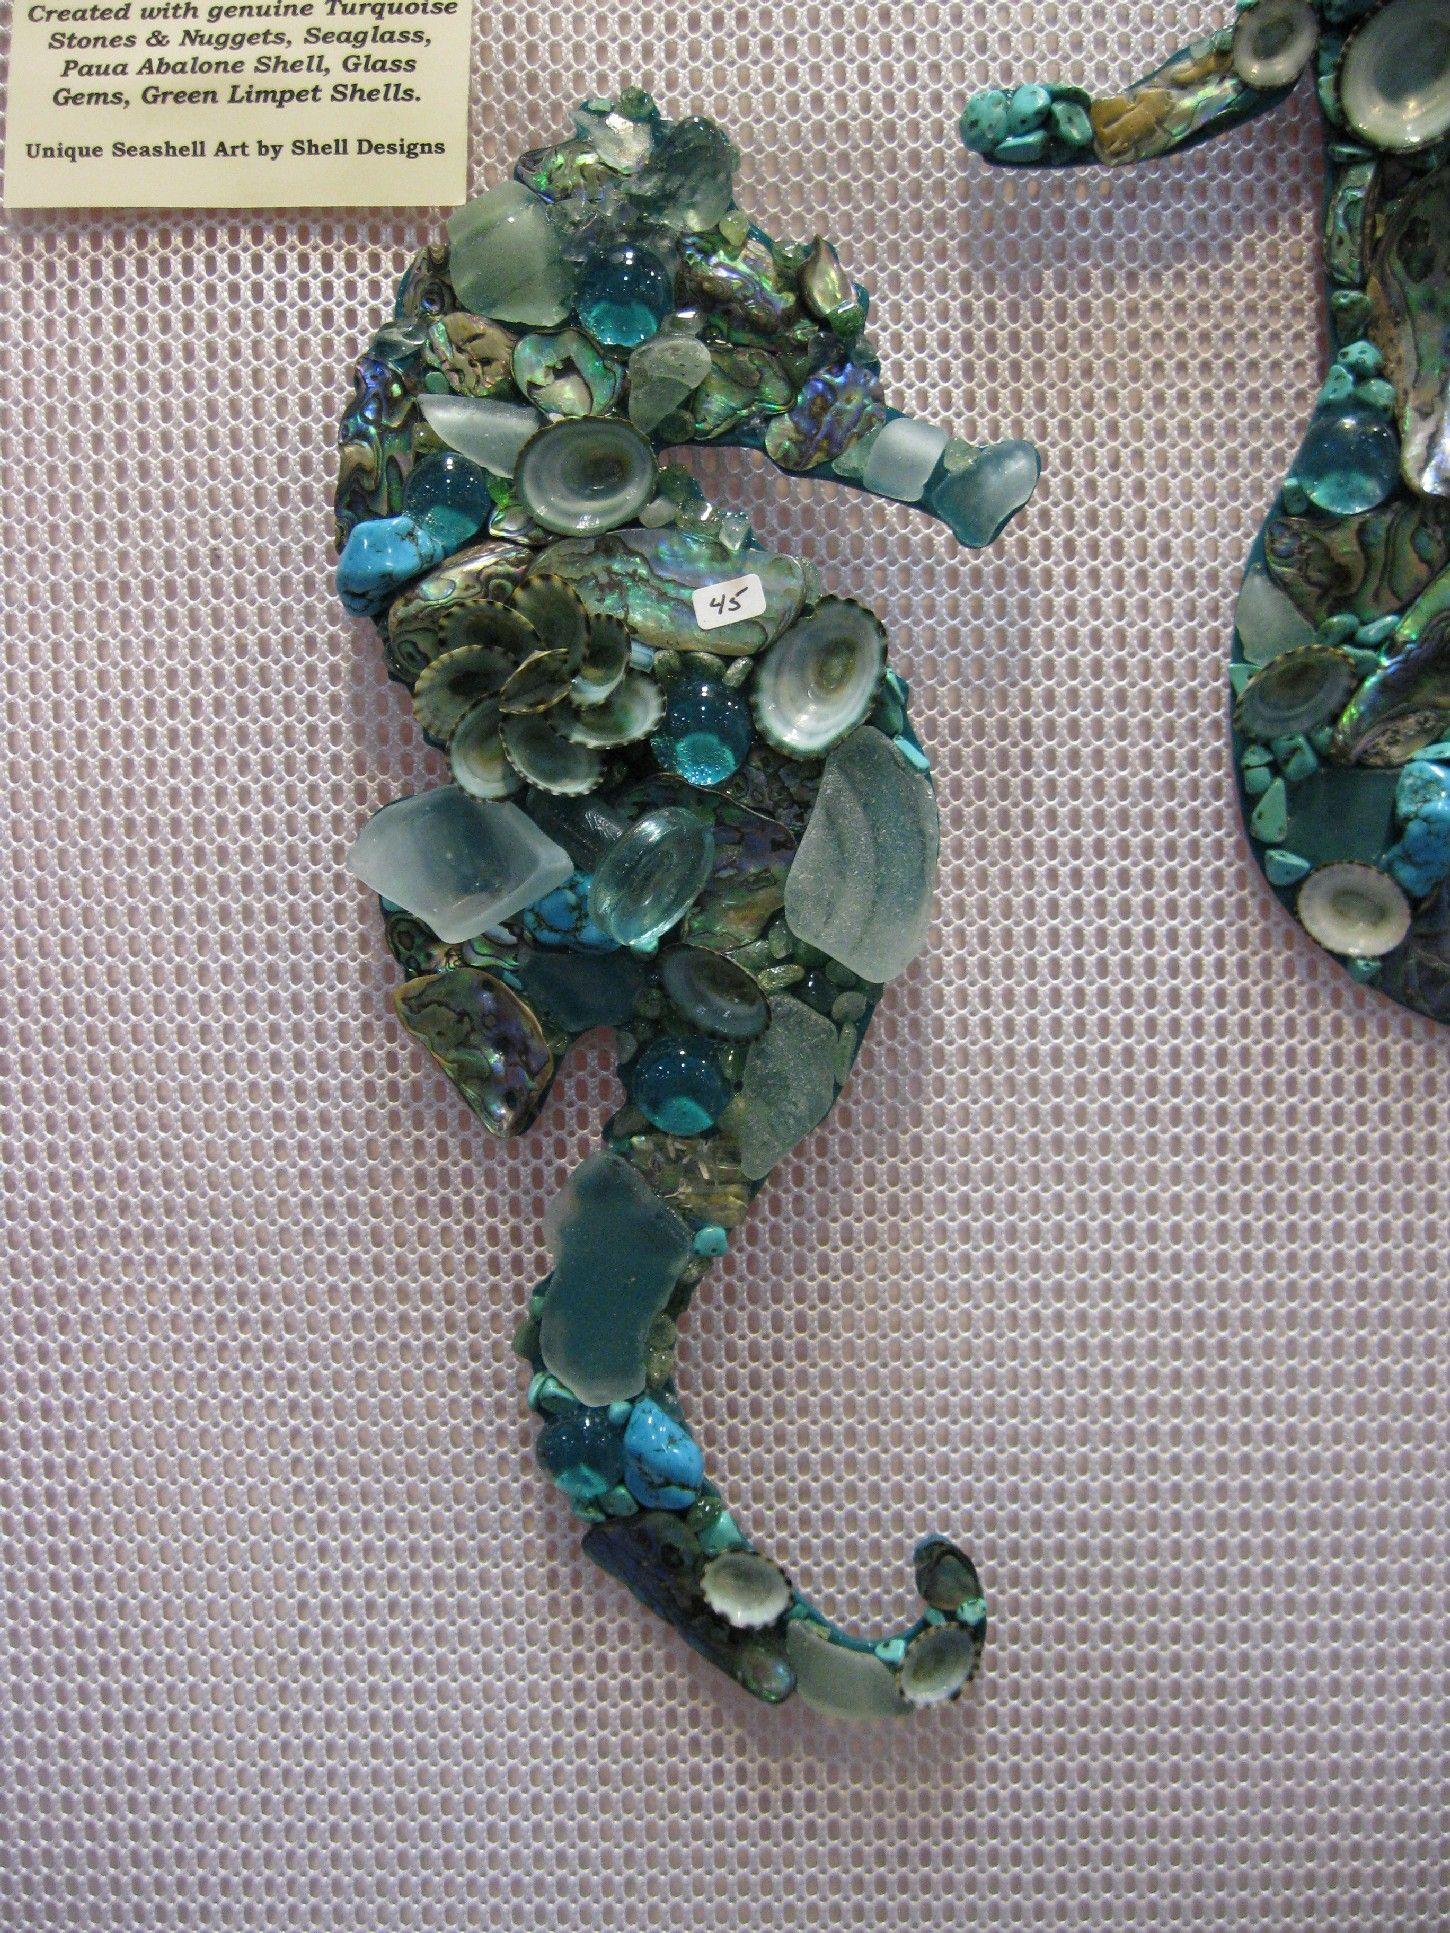 Mosaic Seahorses And Mermaids Shell Designs Shell